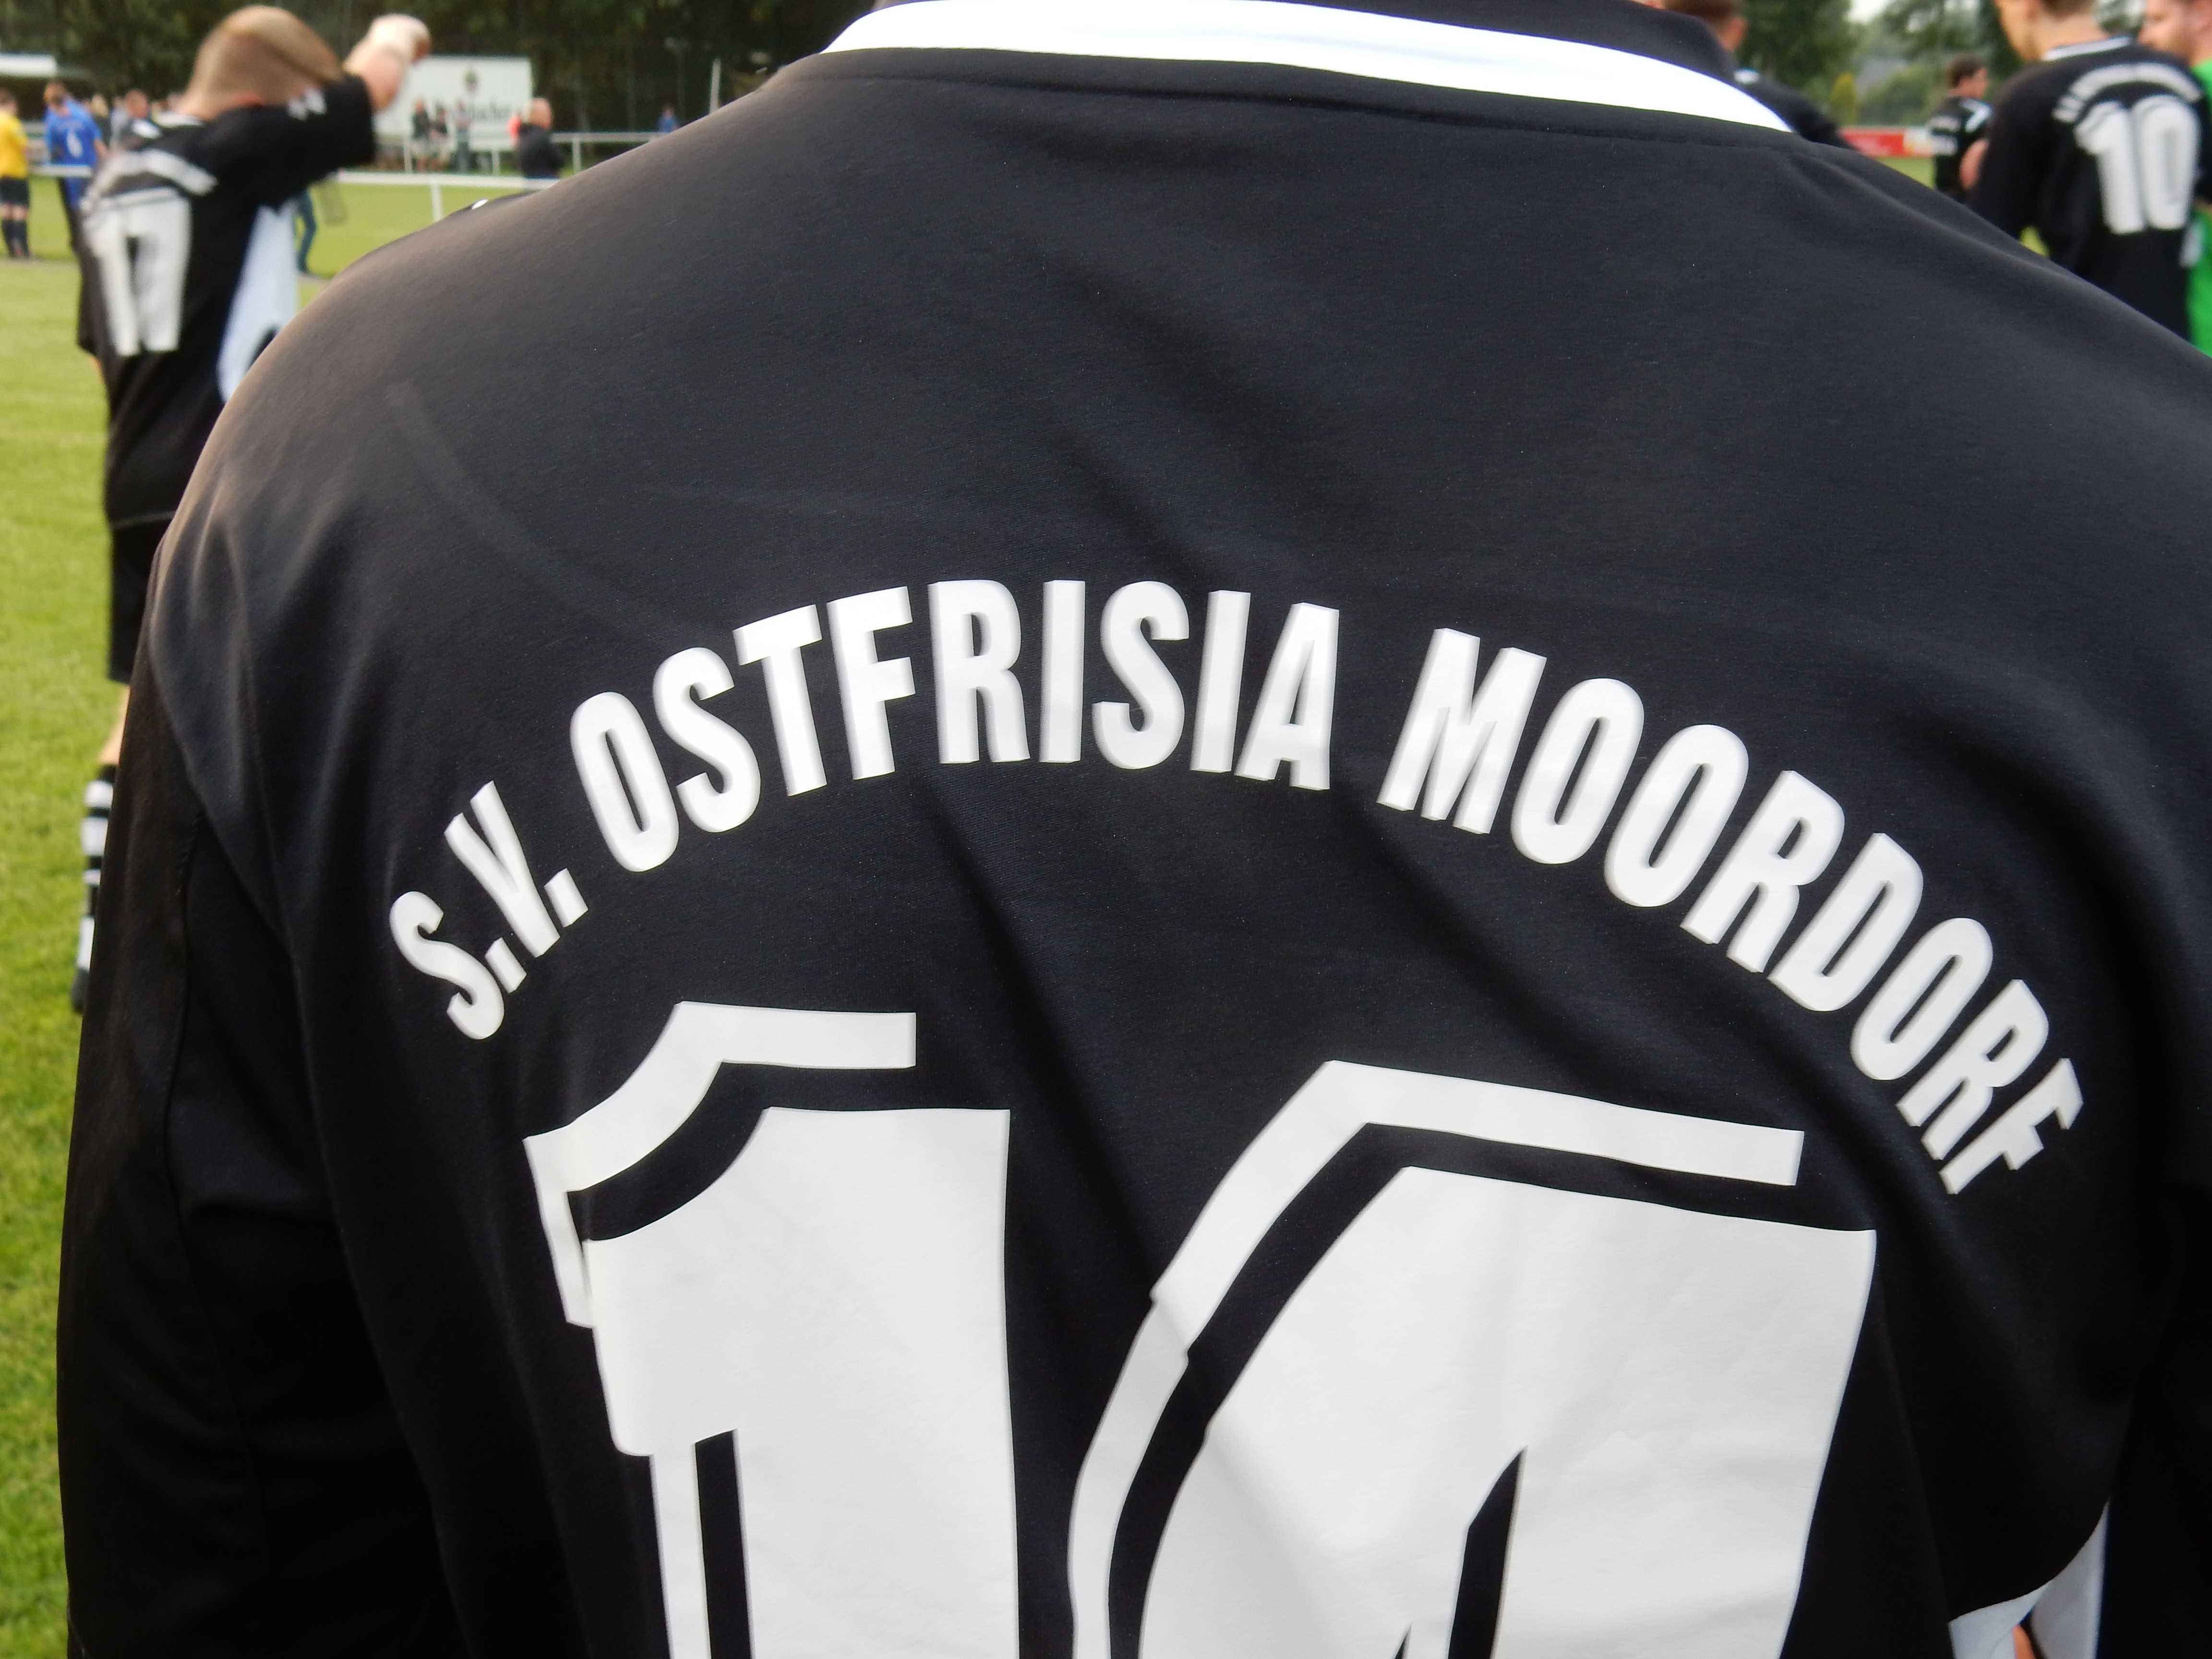 2016-07-28 Sportwoche - erster Donnerstag (45)